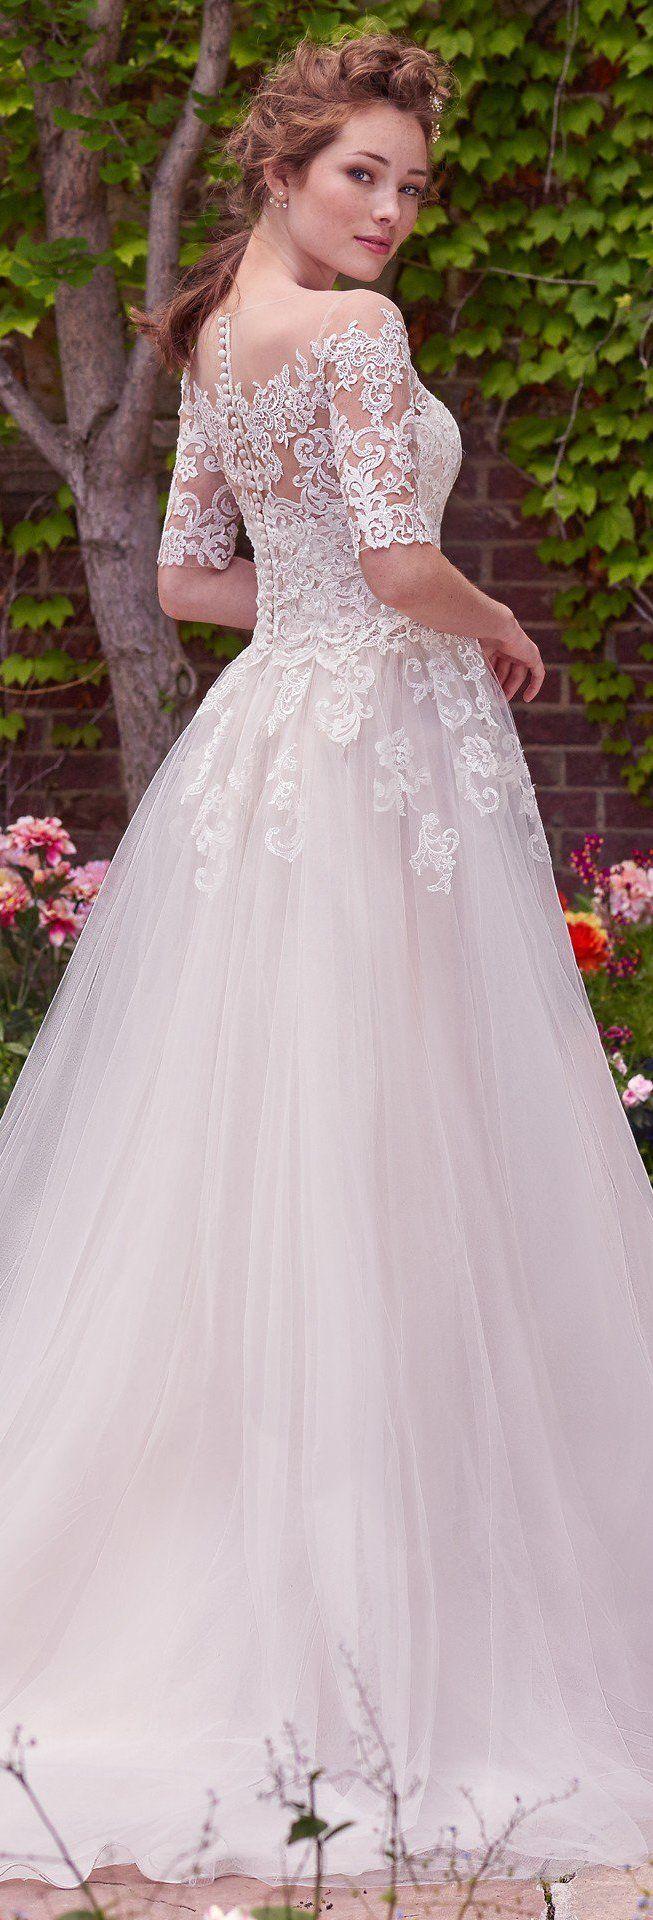 Wedding Dress by Rebecca Ingram - YVONNE | Less than $1,000 | #rebeccaingram #rebeccabride